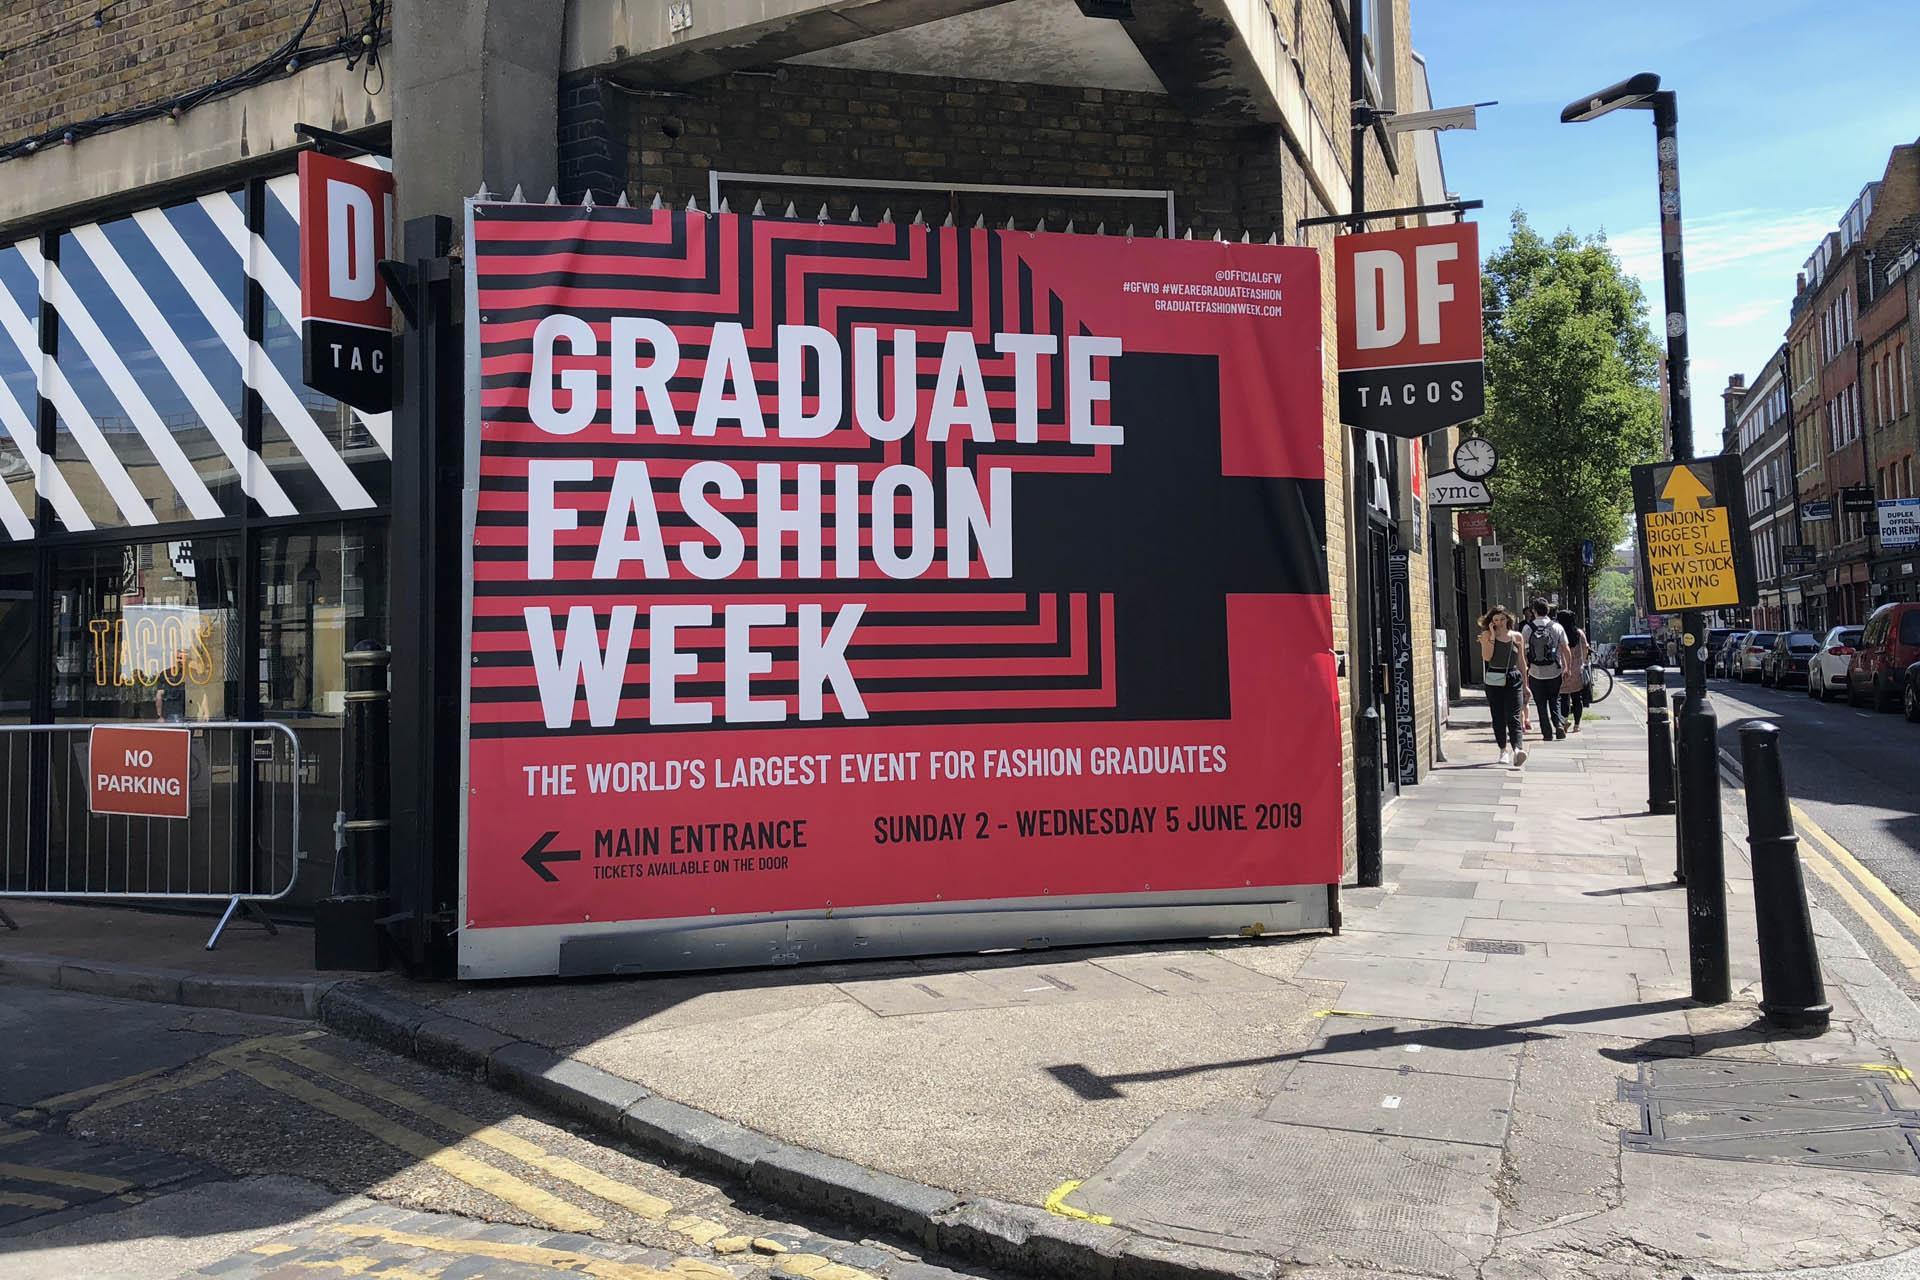 Graduate Fashion Week 2019 PCV canvas entrance gate signage banner